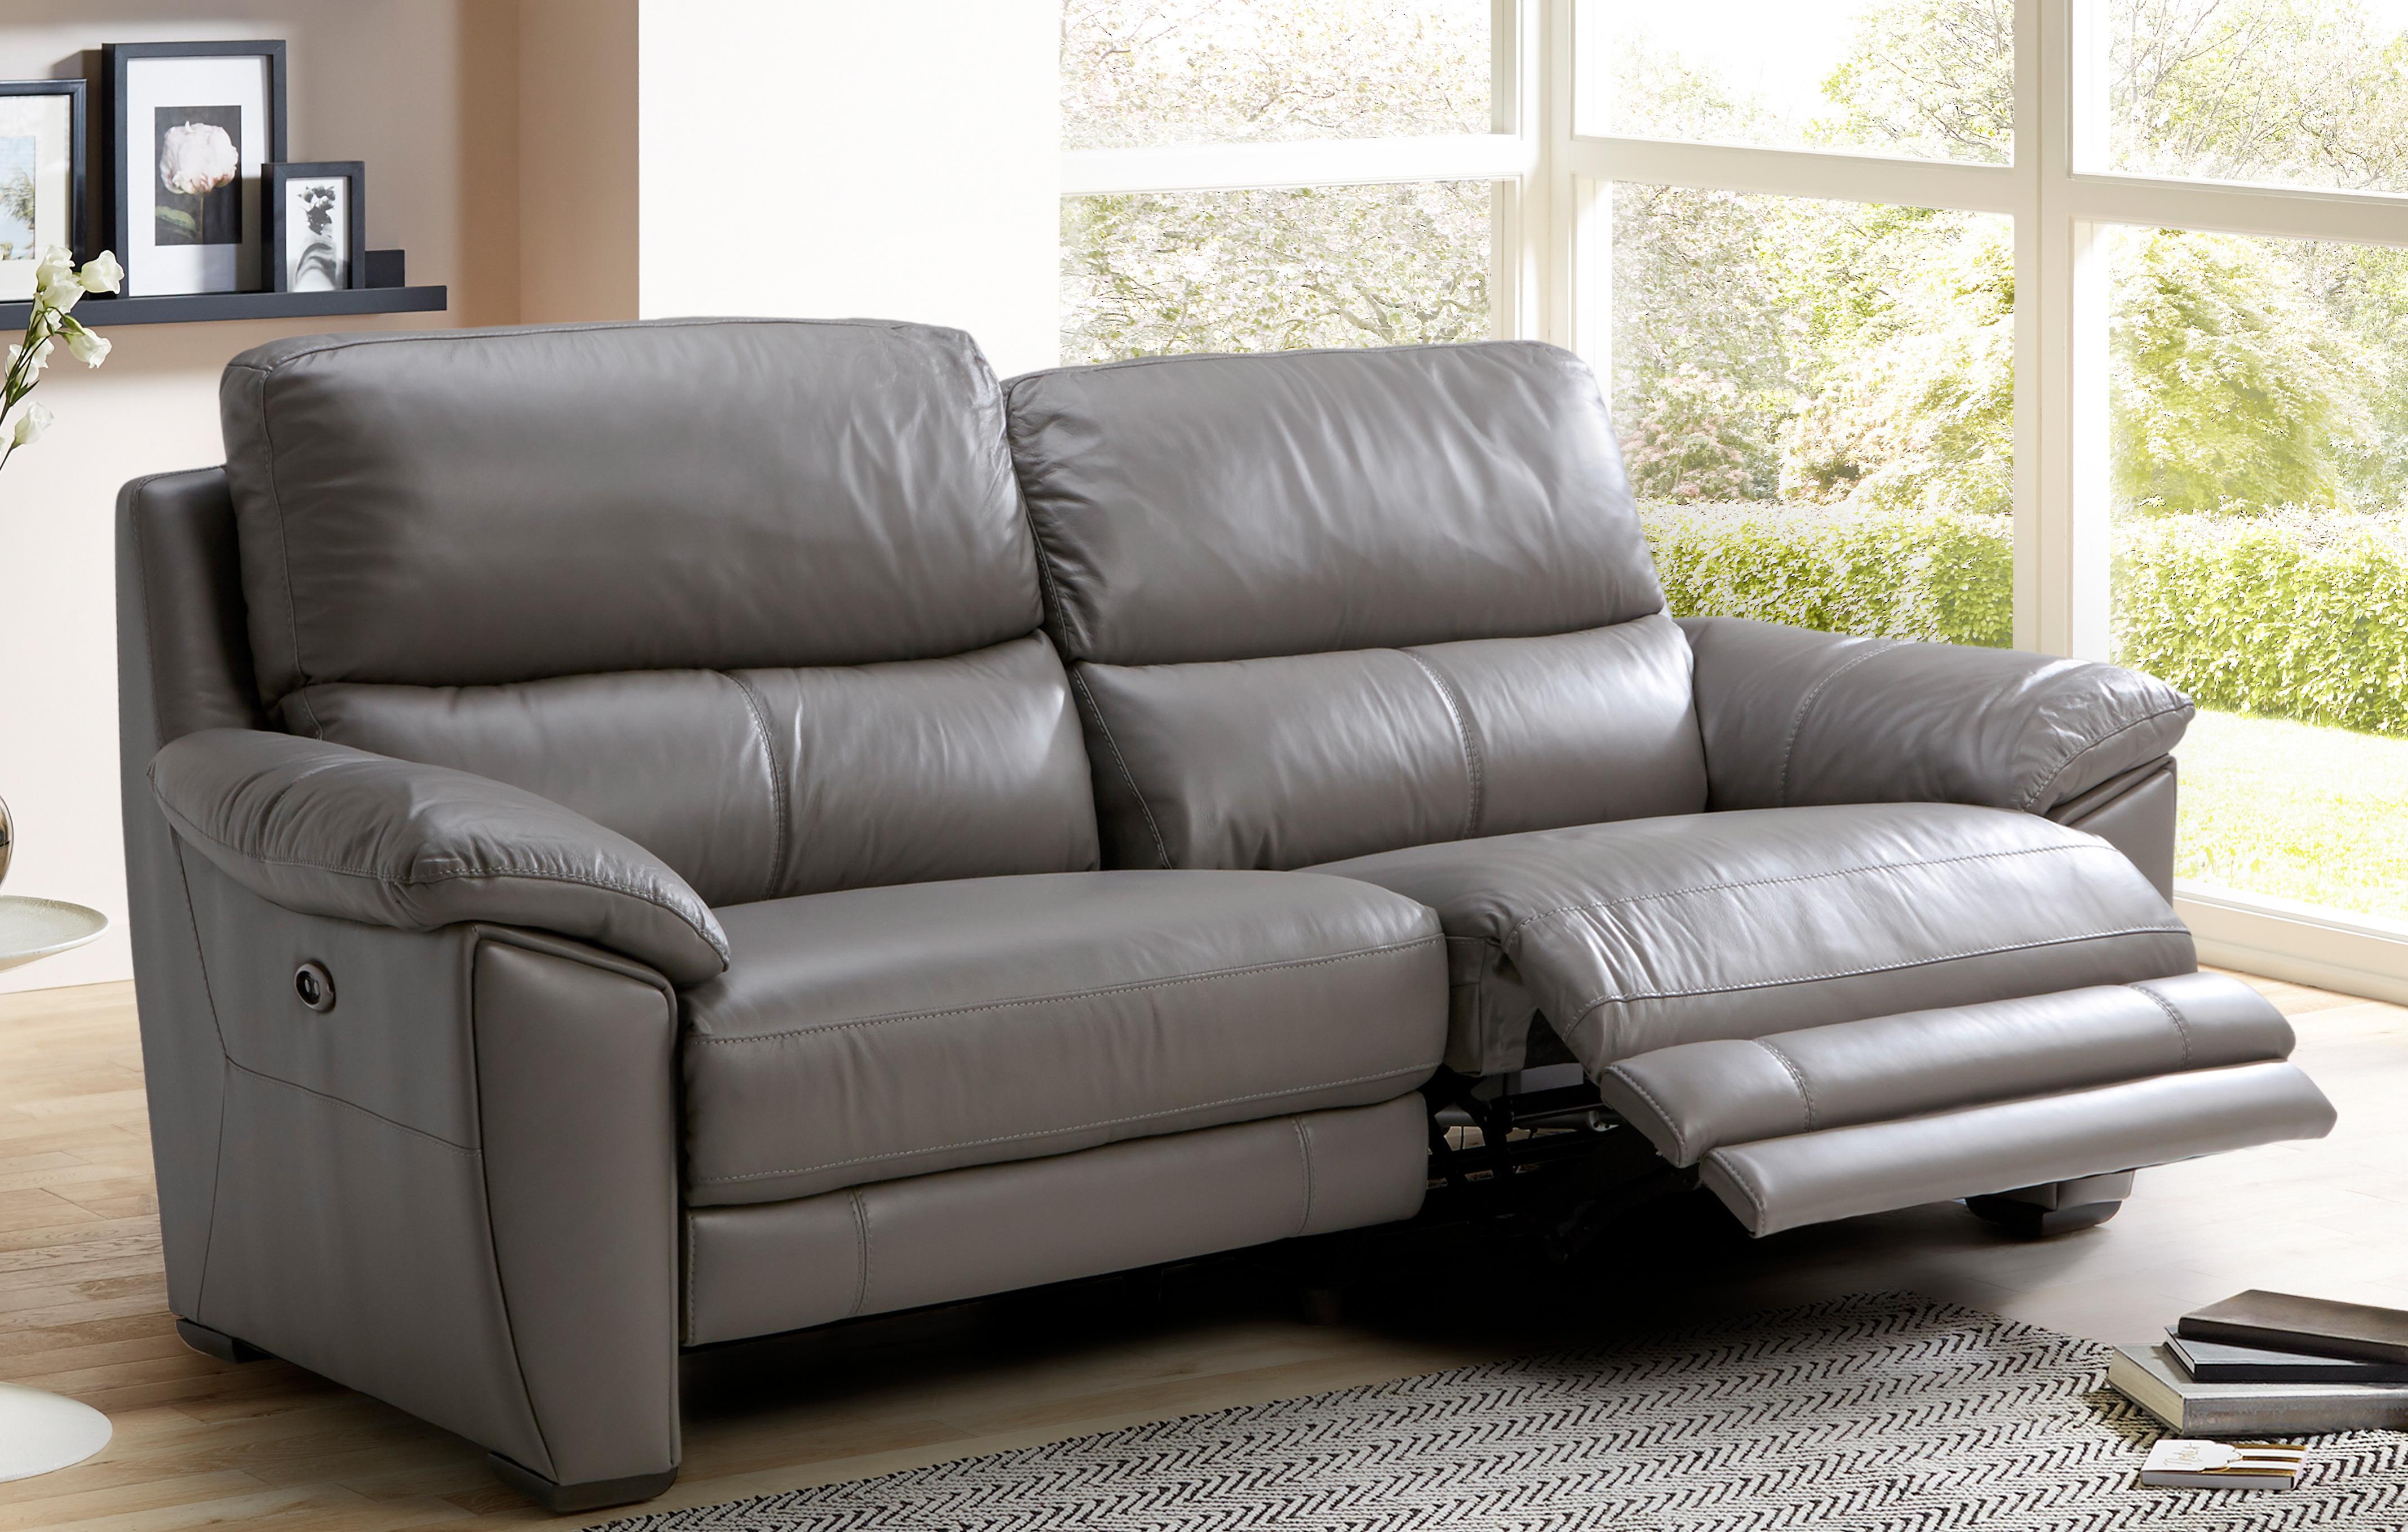 Best of sectional sofa ottawa kijiji sectional sofas for Sectional sofa kijiji ottawa